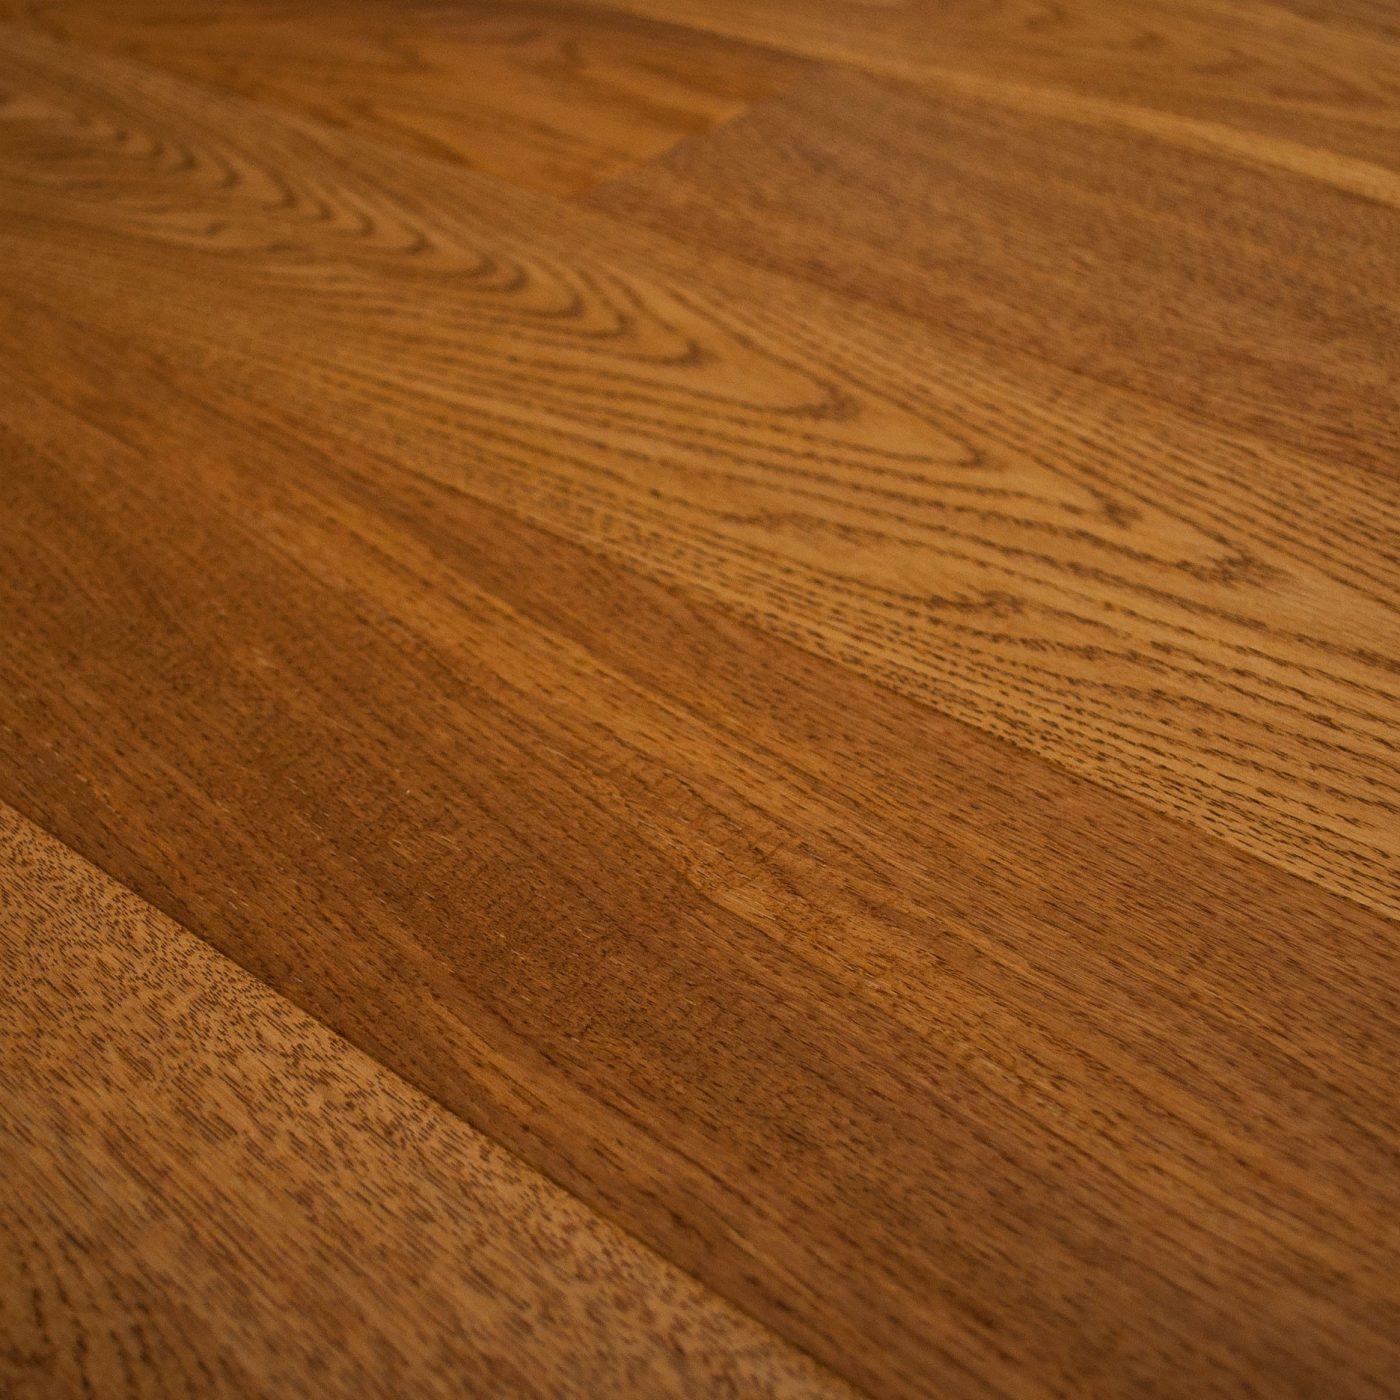 10mm HDF Golden Lacquered & Handscraped Wood Flooring1